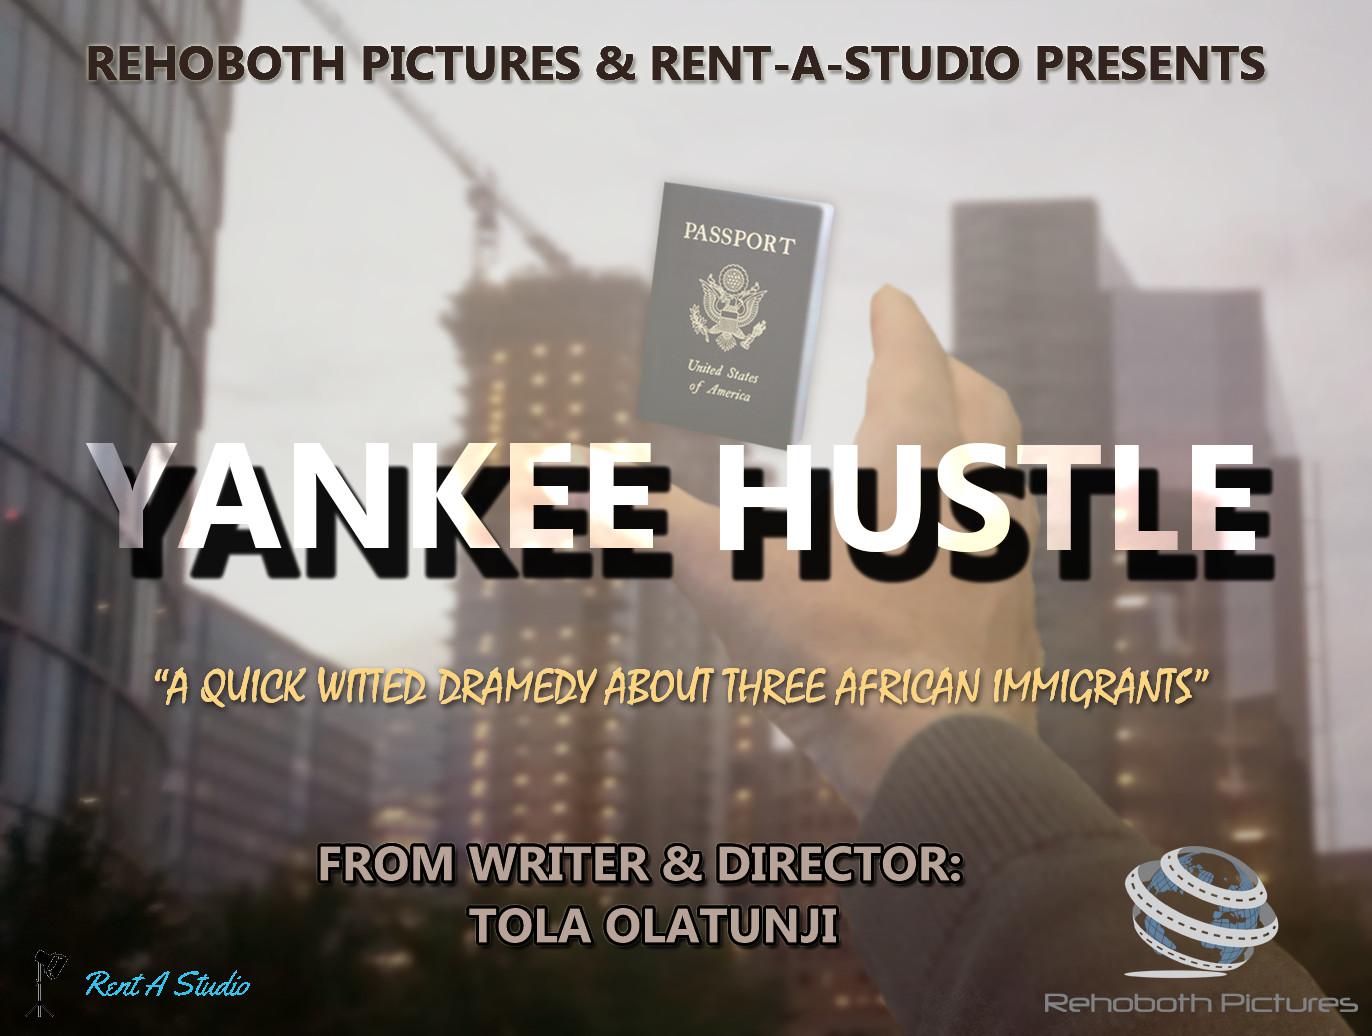 Yankee Hustle